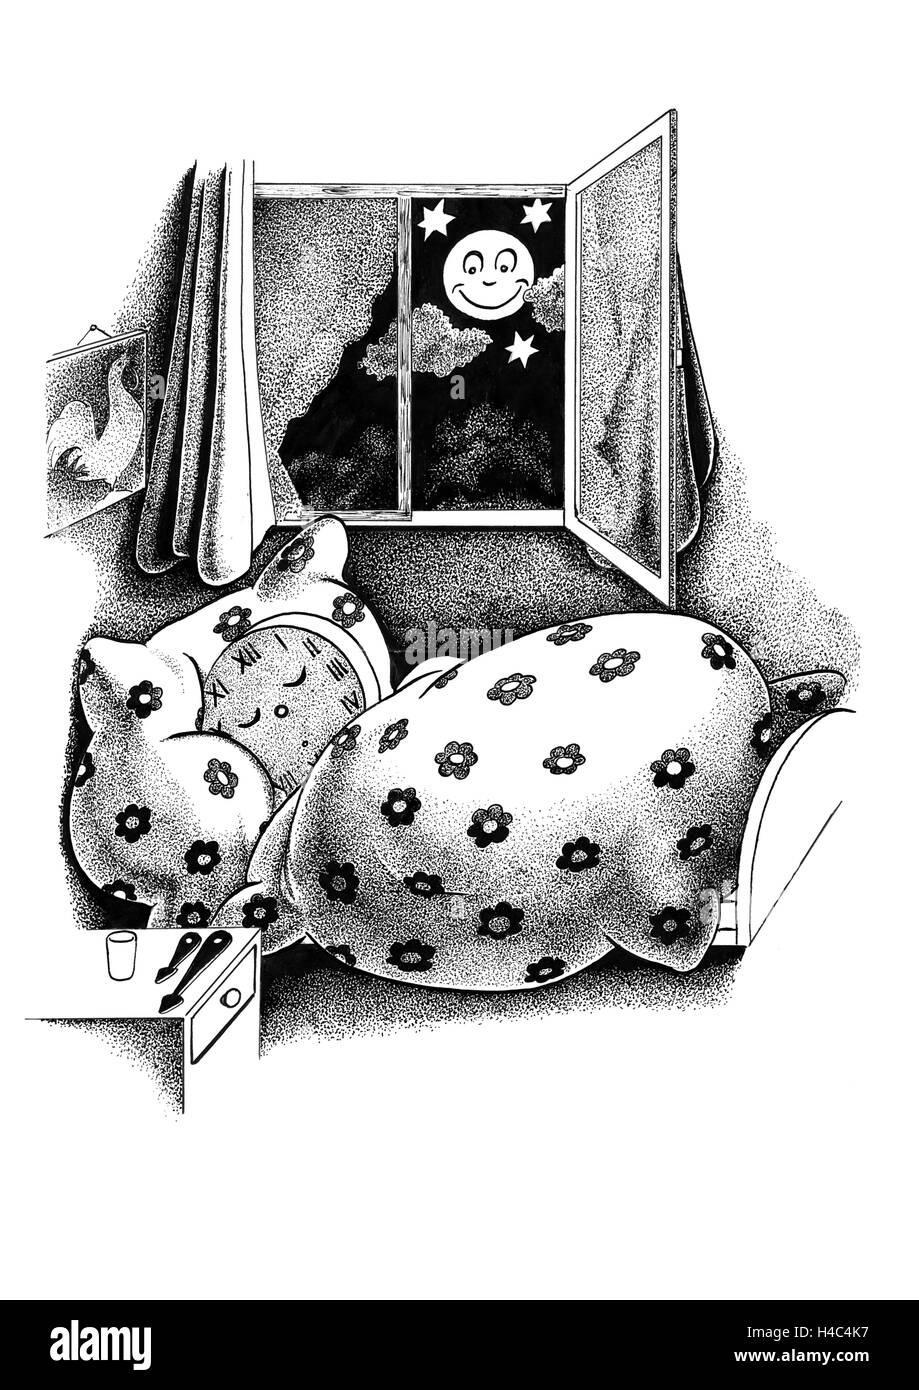 Clock in the duvet - Stock Image